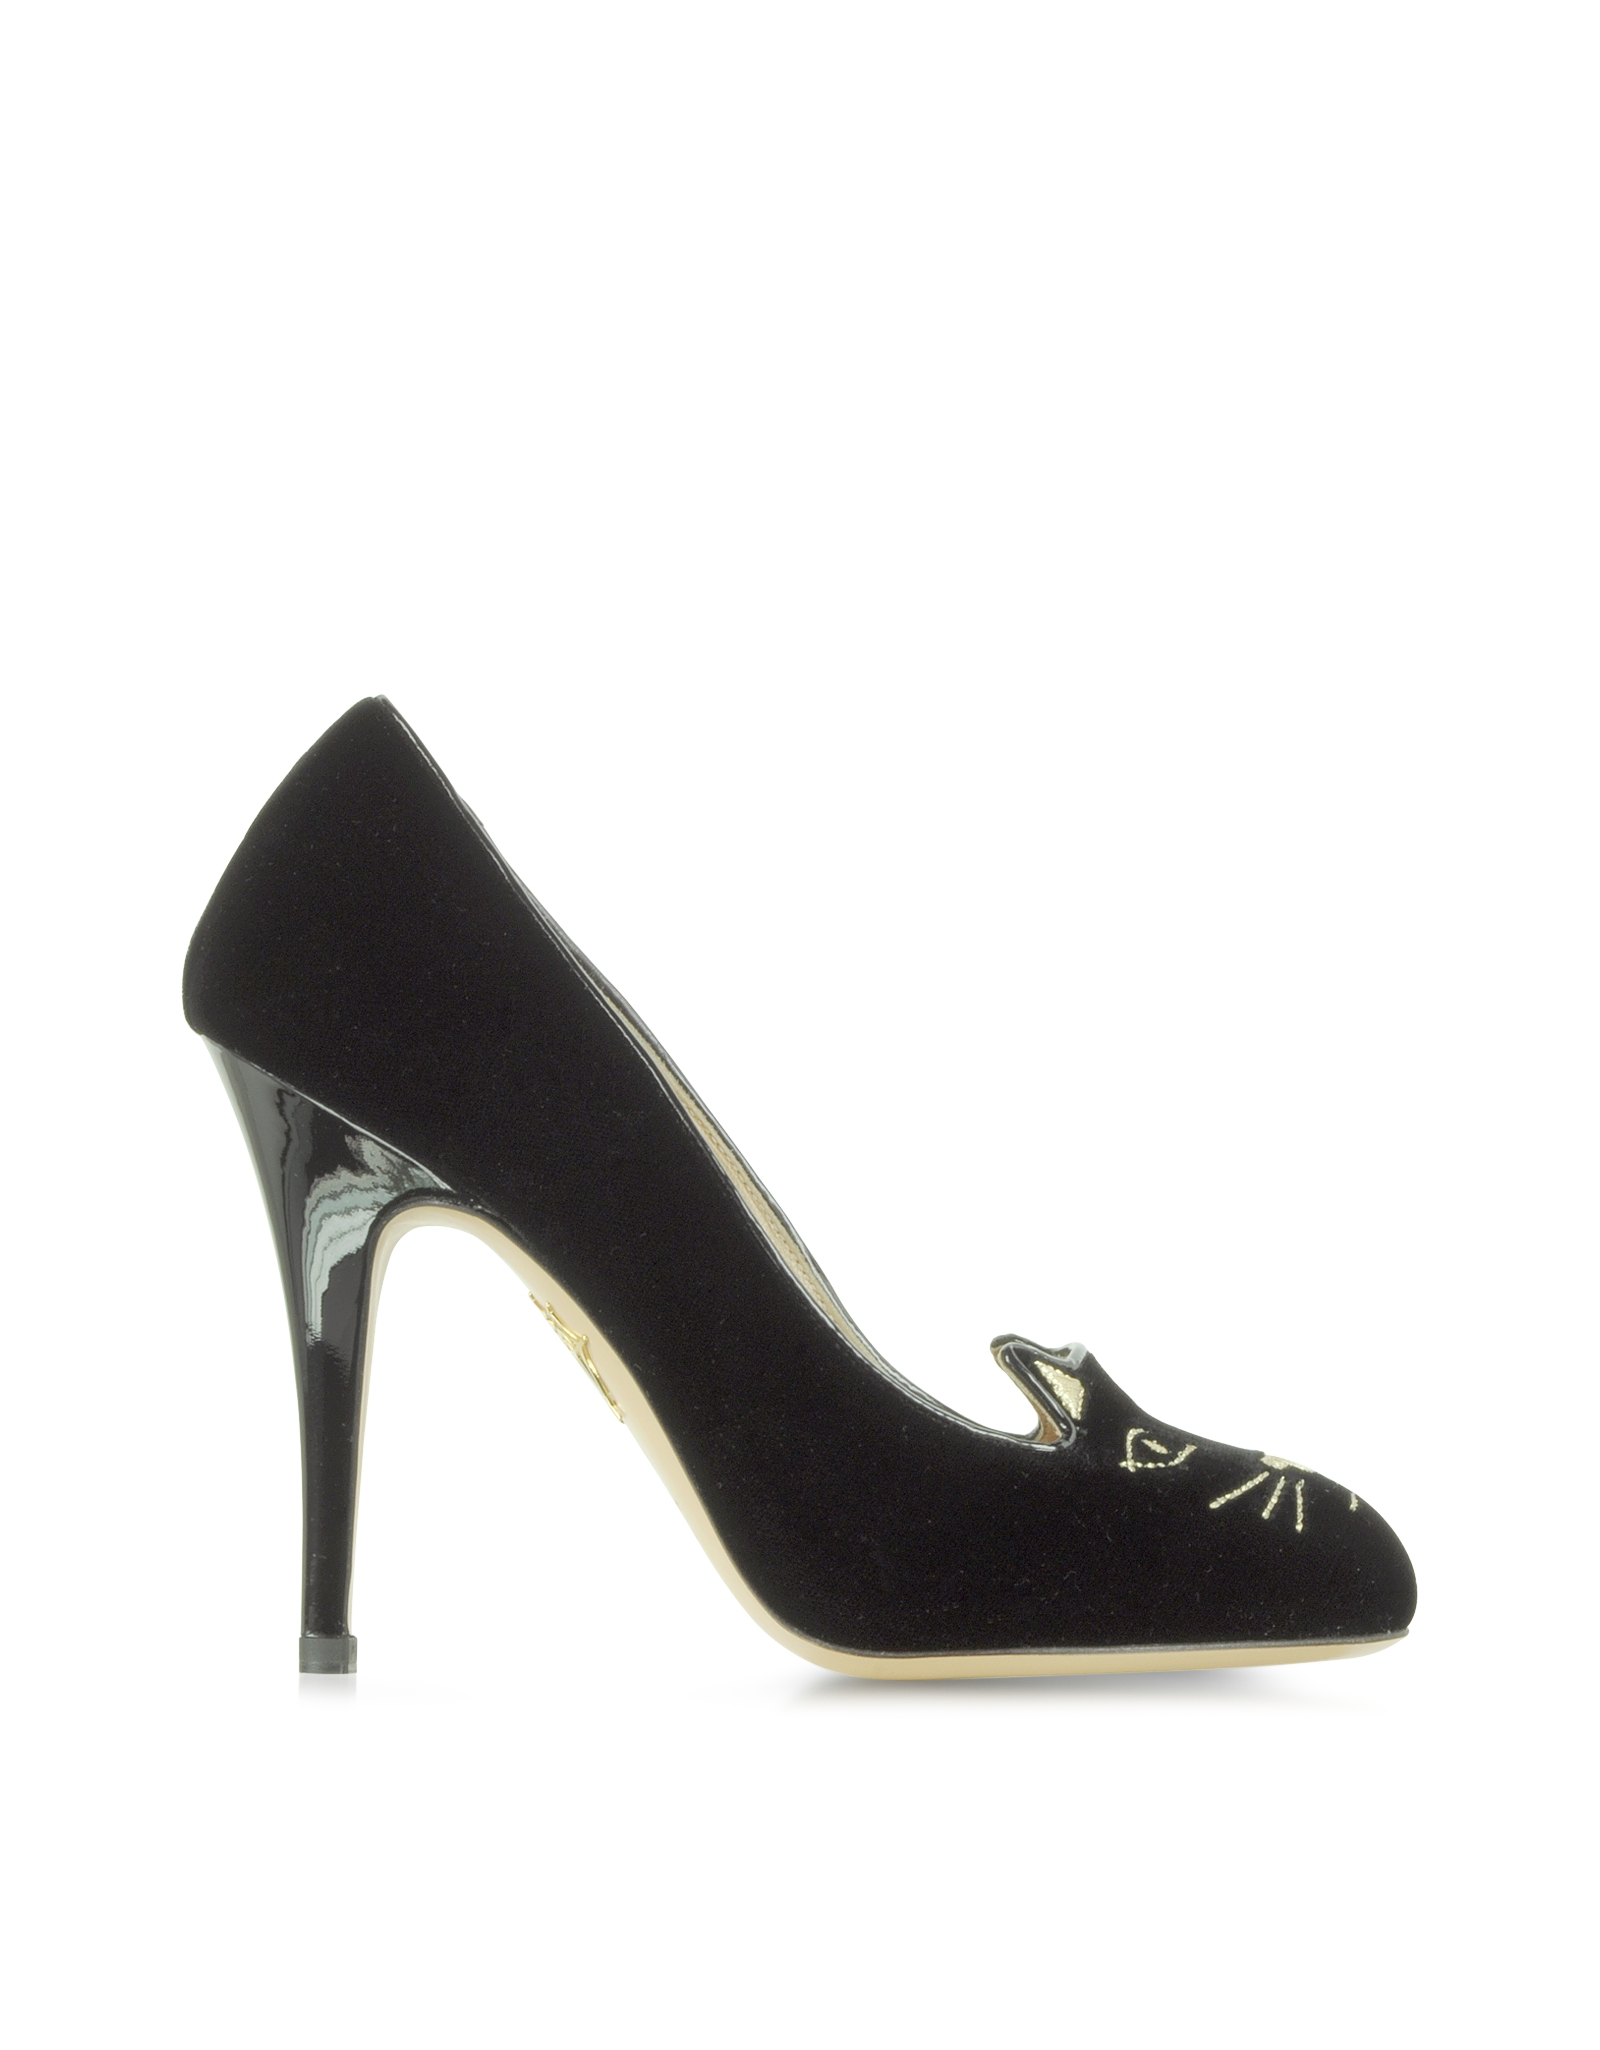 Charlotte Olympia KITTY Kitty velvet high heeled shoes black size: 35 12 (Charlotte Olympia)